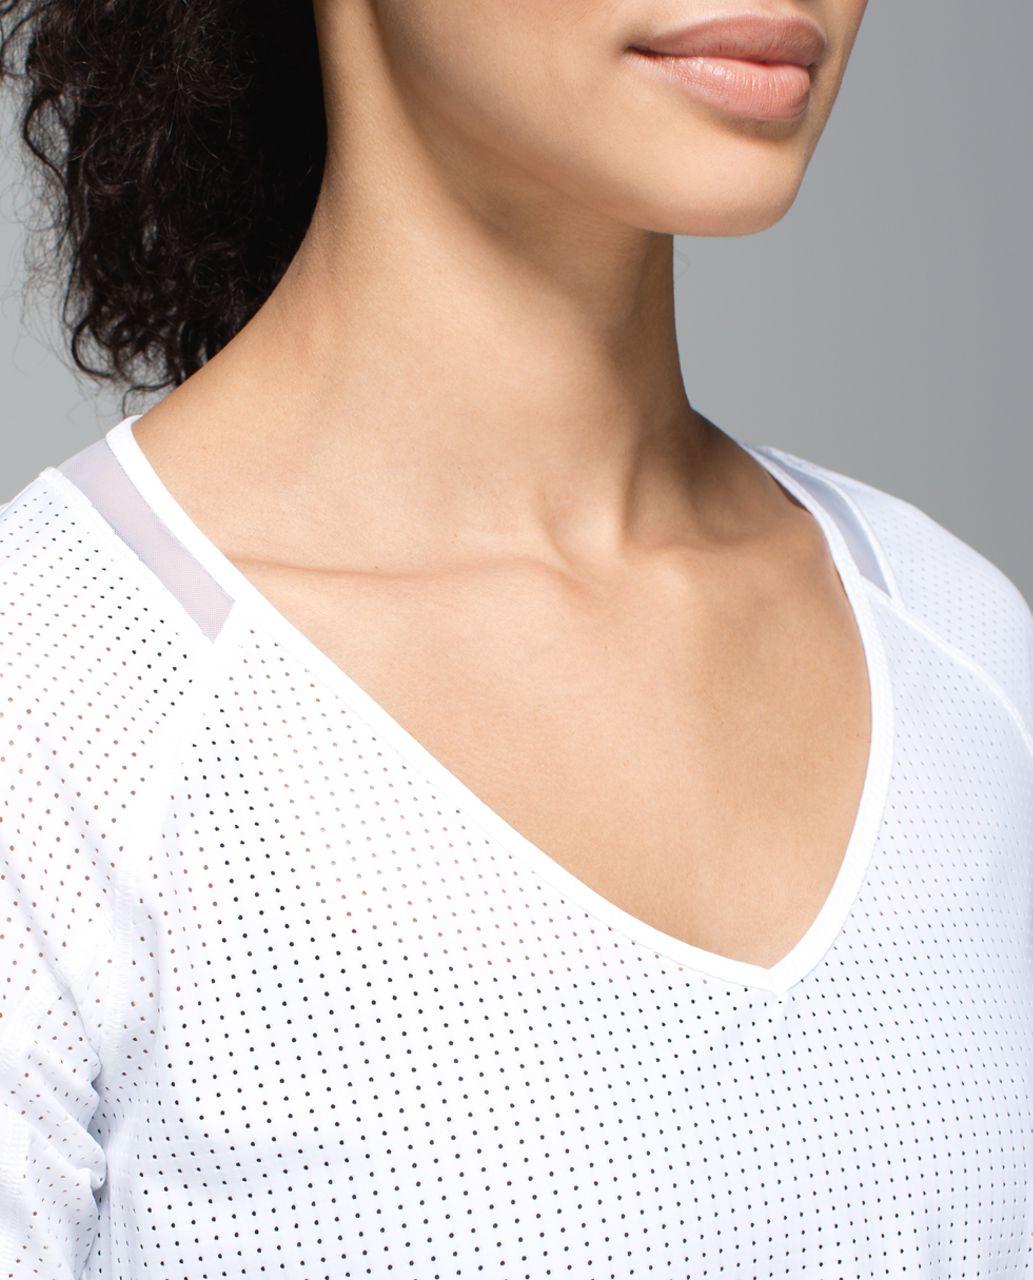 Lululemon Var-City 1/2 Sleeve - White